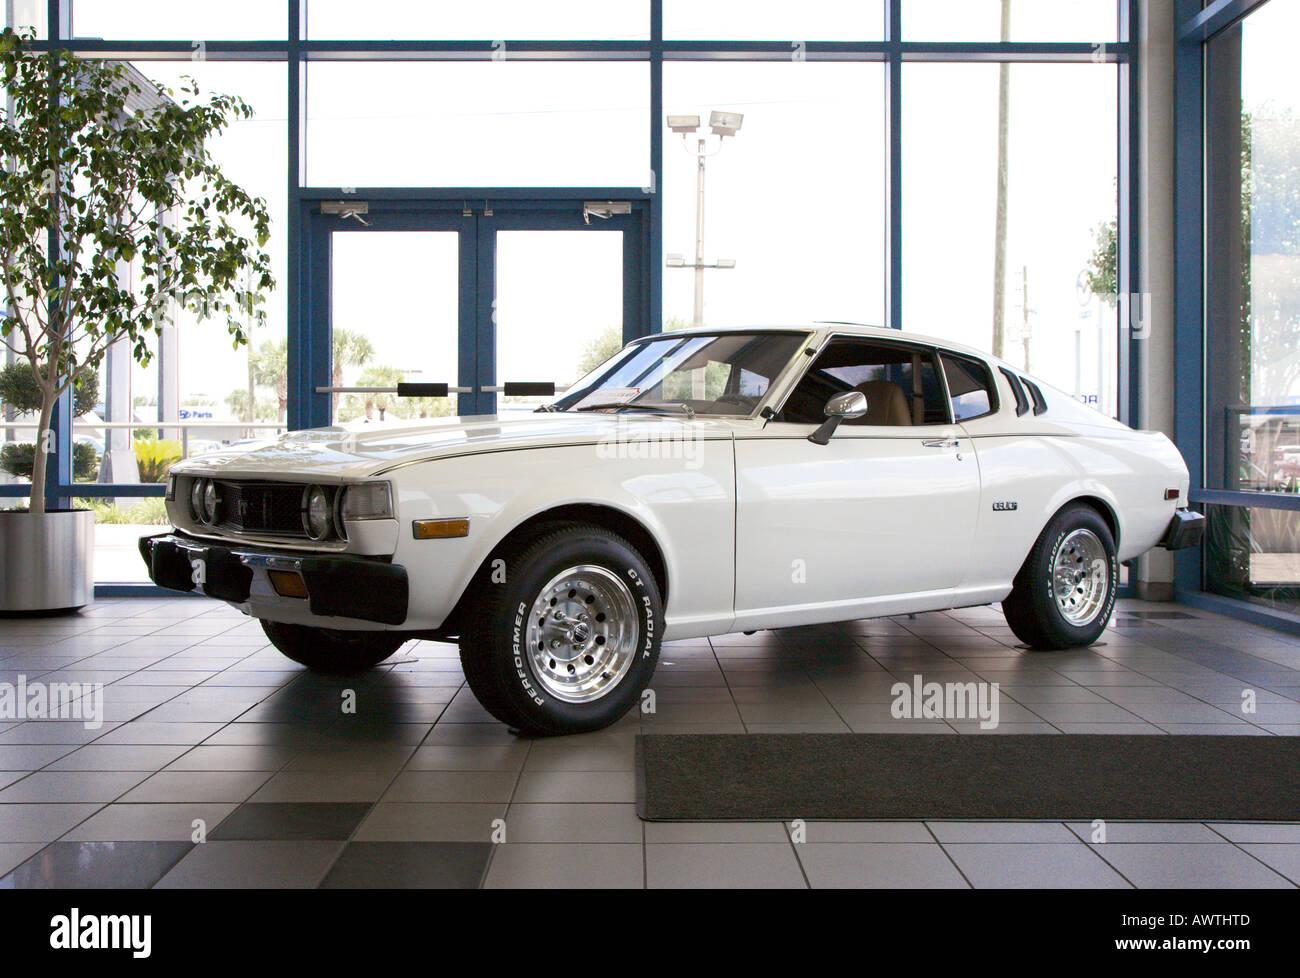 1976 Toyota Celica Liftback Coupe Display In Dealership